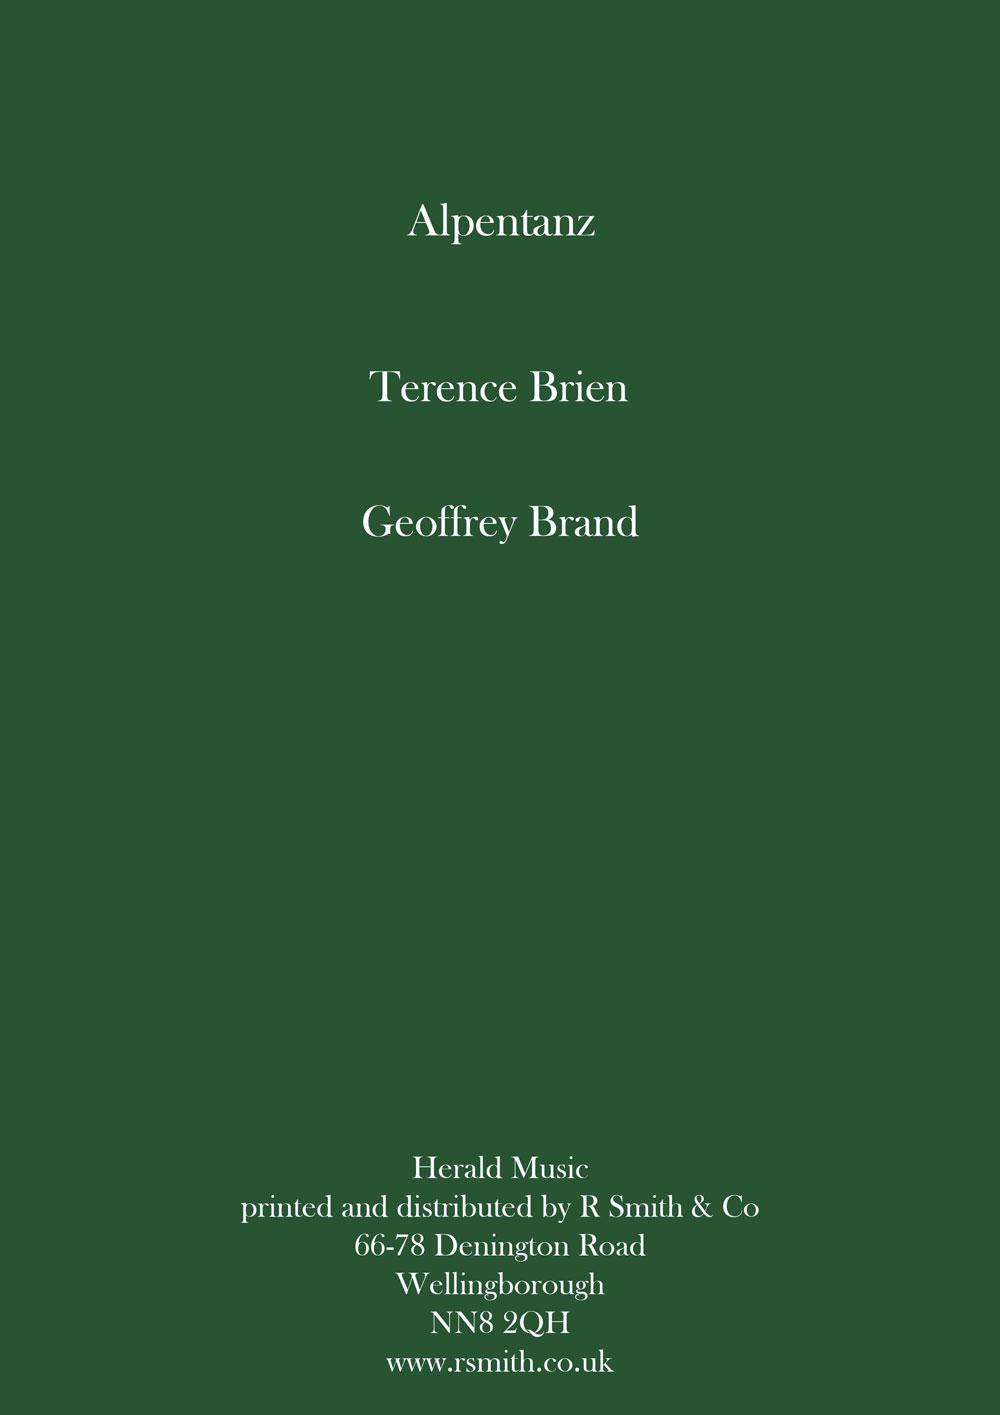 Alpentanz (Brass Band - Score and Parts)